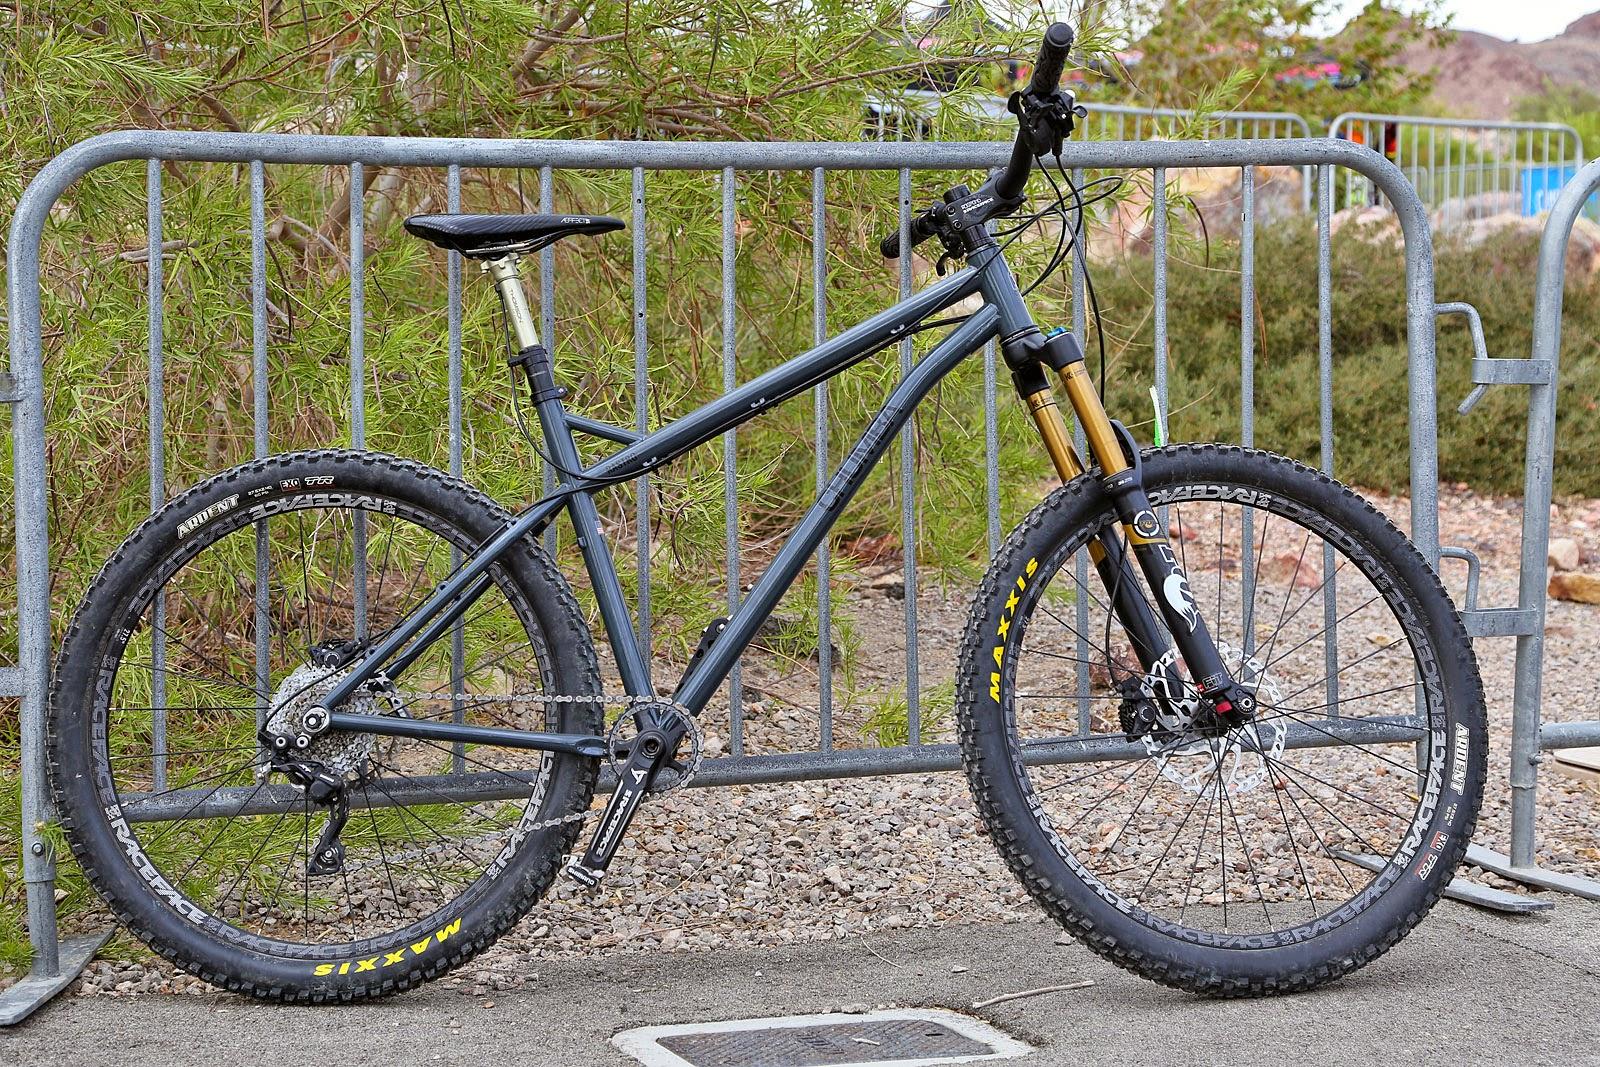 interbike 2014 chumba rastro 2015 hardtail am bike arm. Black Bedroom Furniture Sets. Home Design Ideas